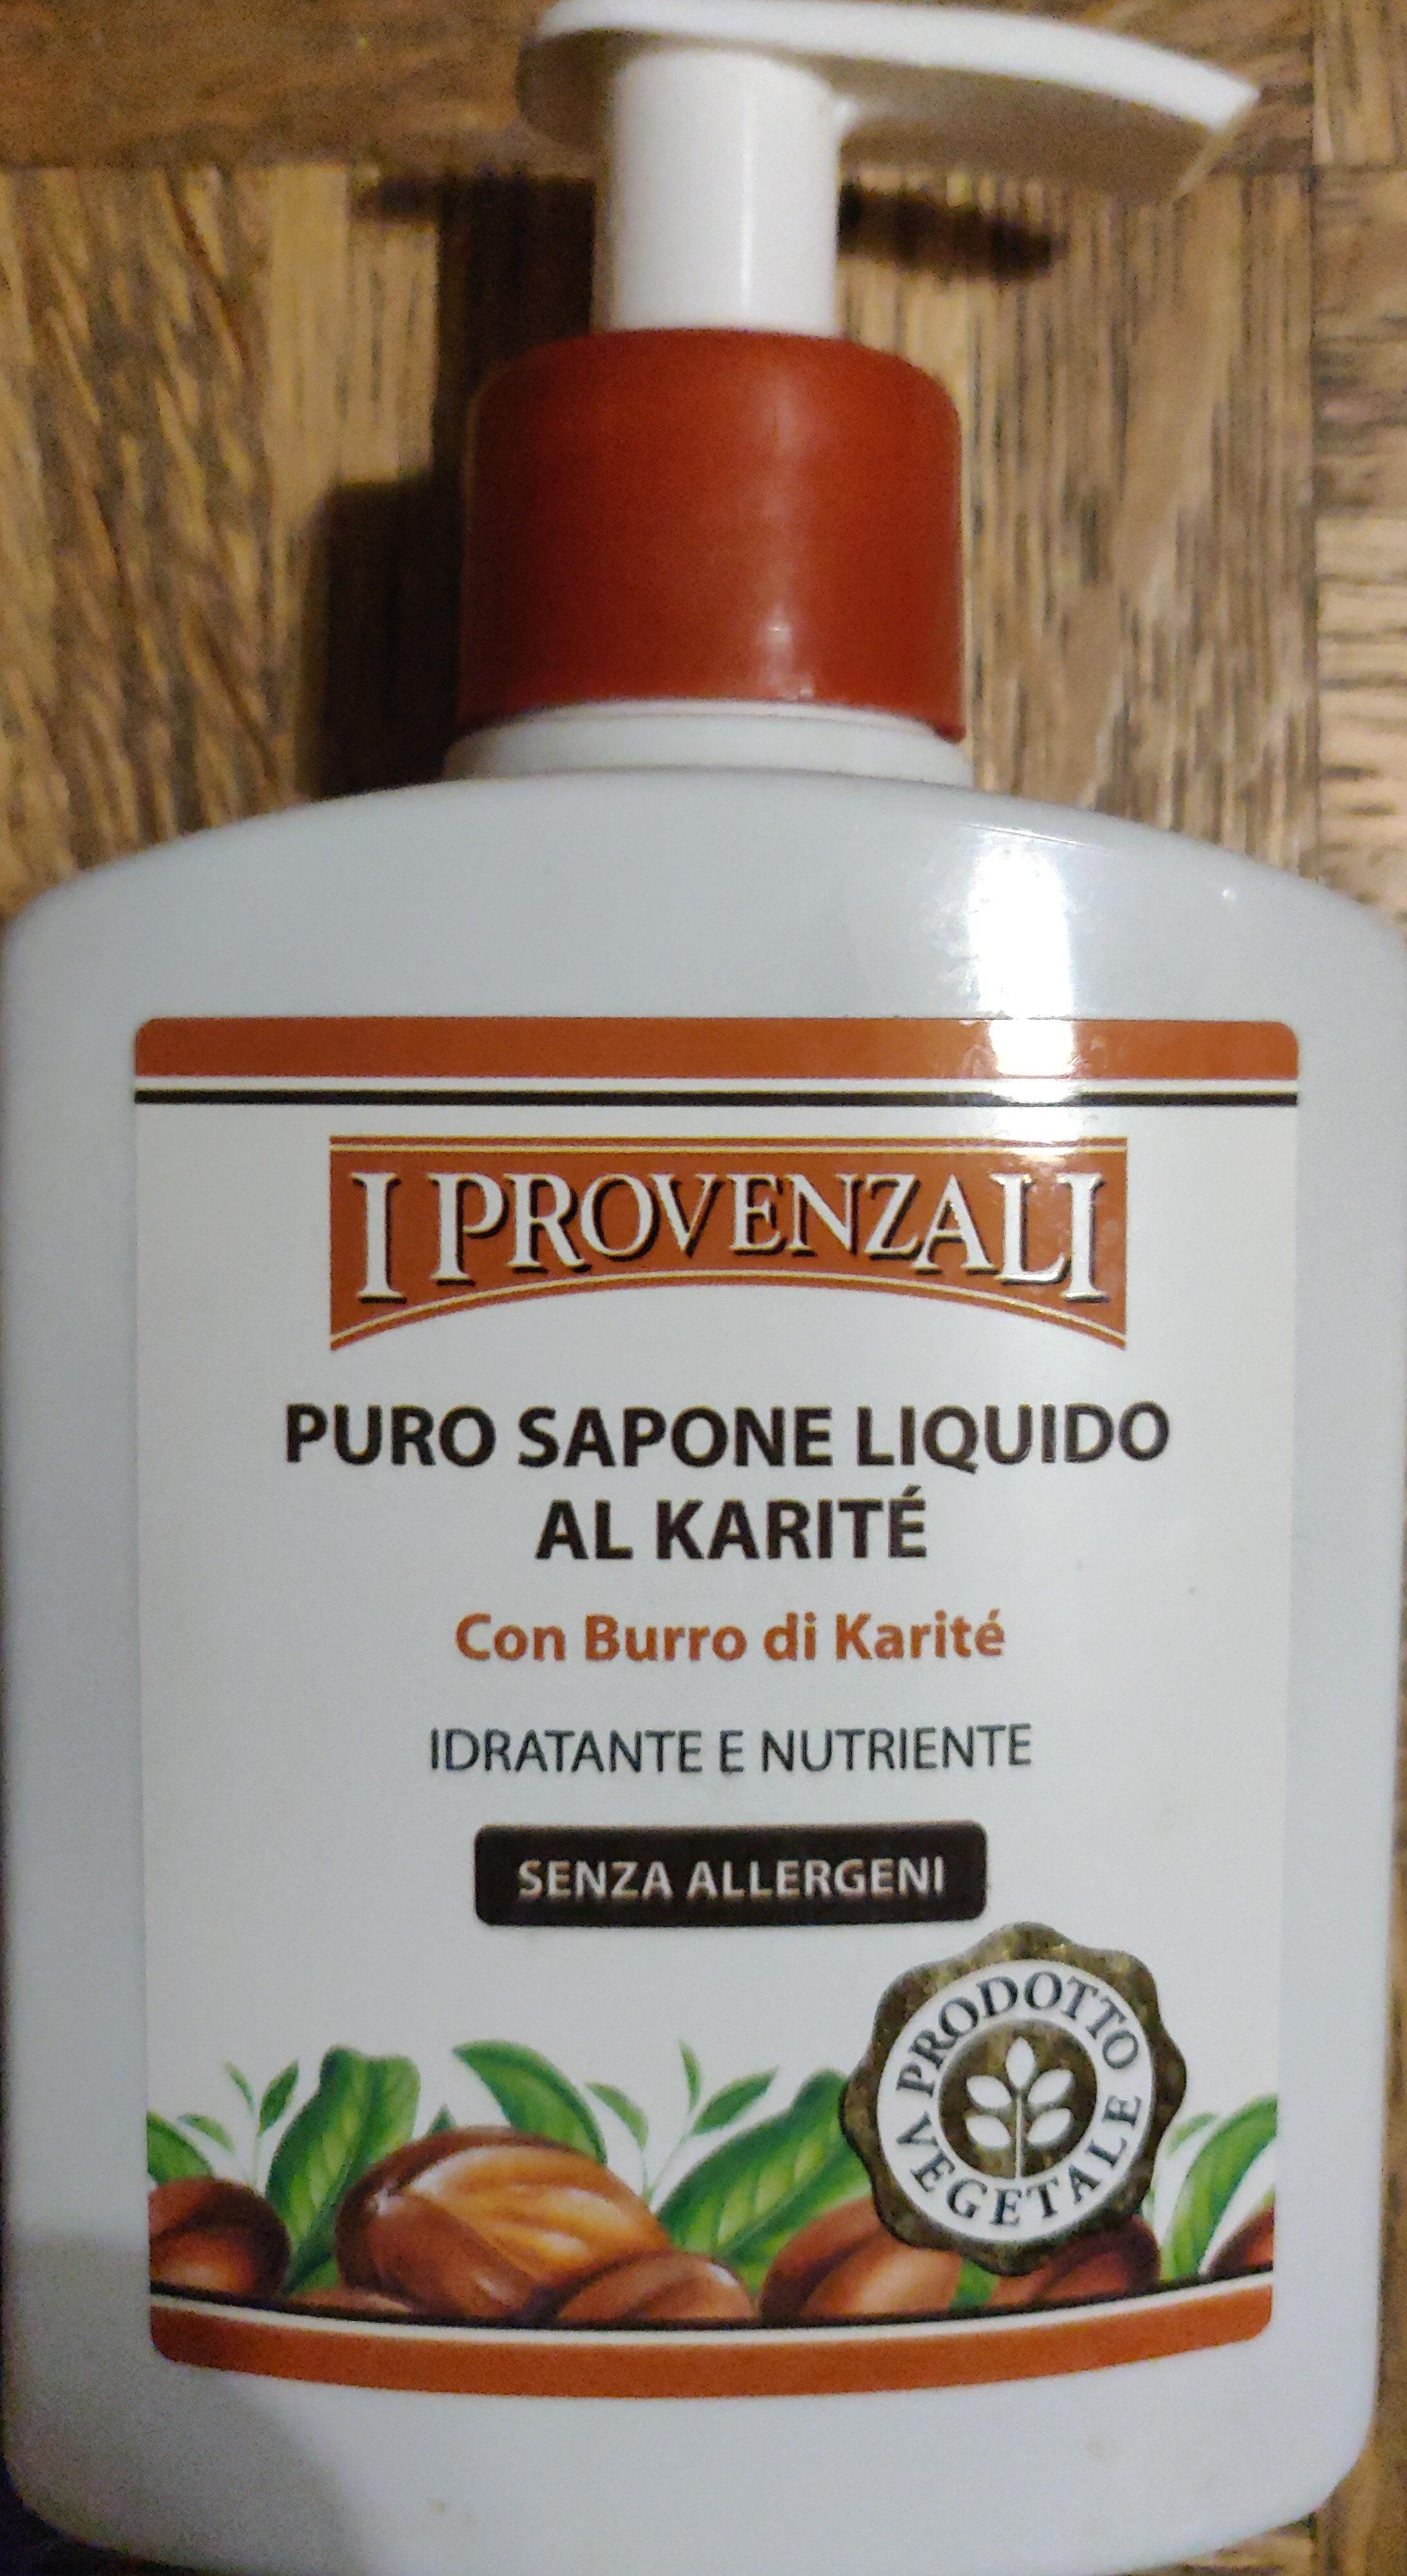 Puro sapone liquido al karité - Produit - it